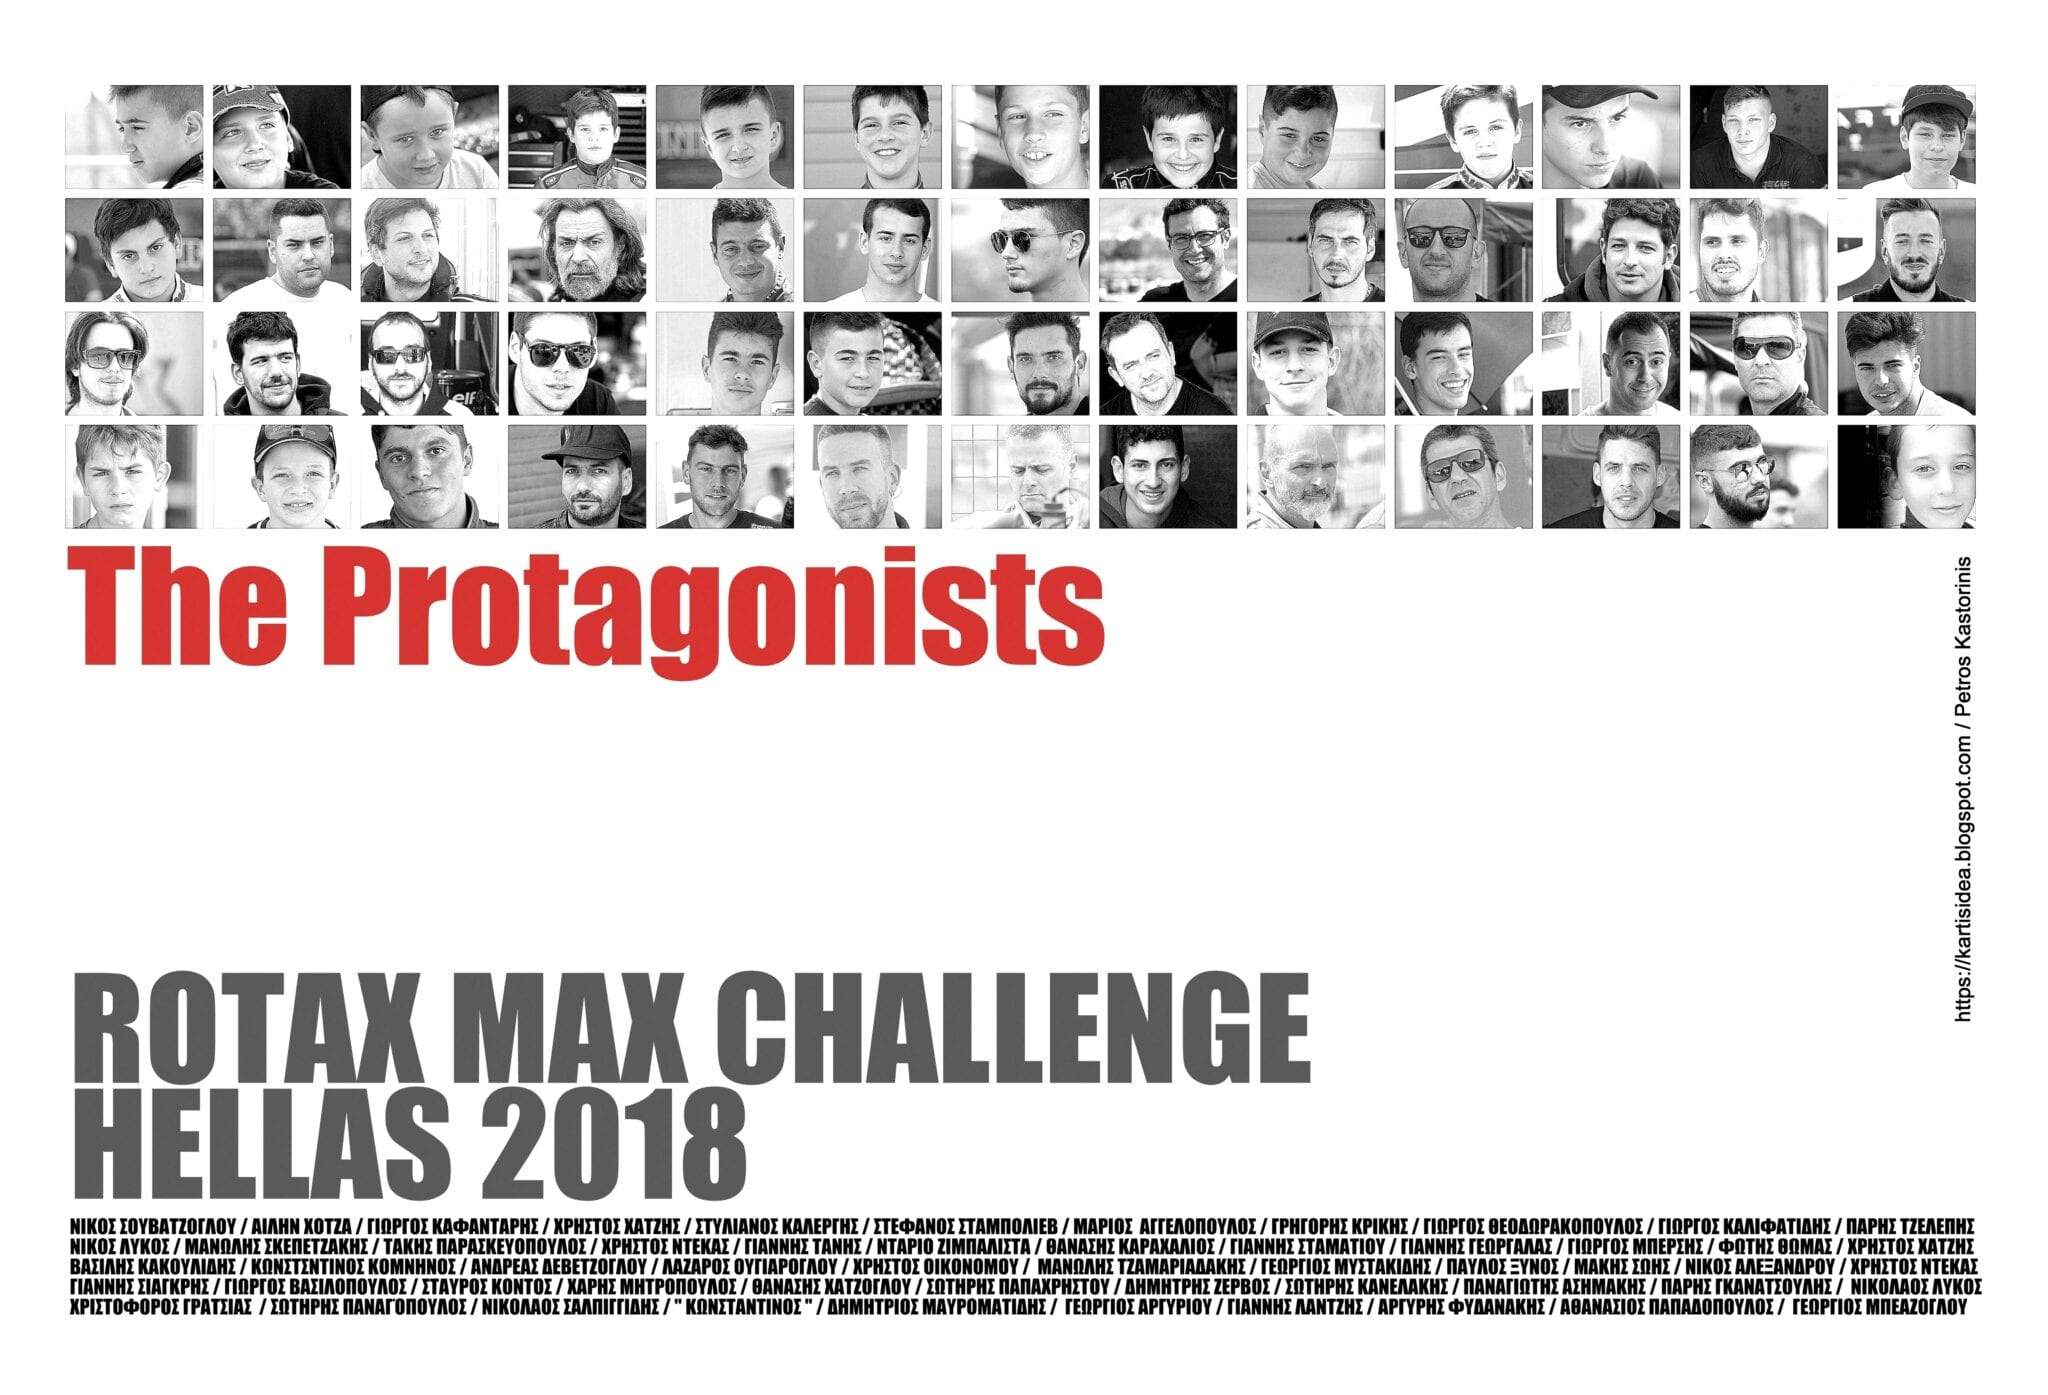 Rotax Max Challenge 2019: Πρωταγωνιστές Είναι Οι Οδηγοί!